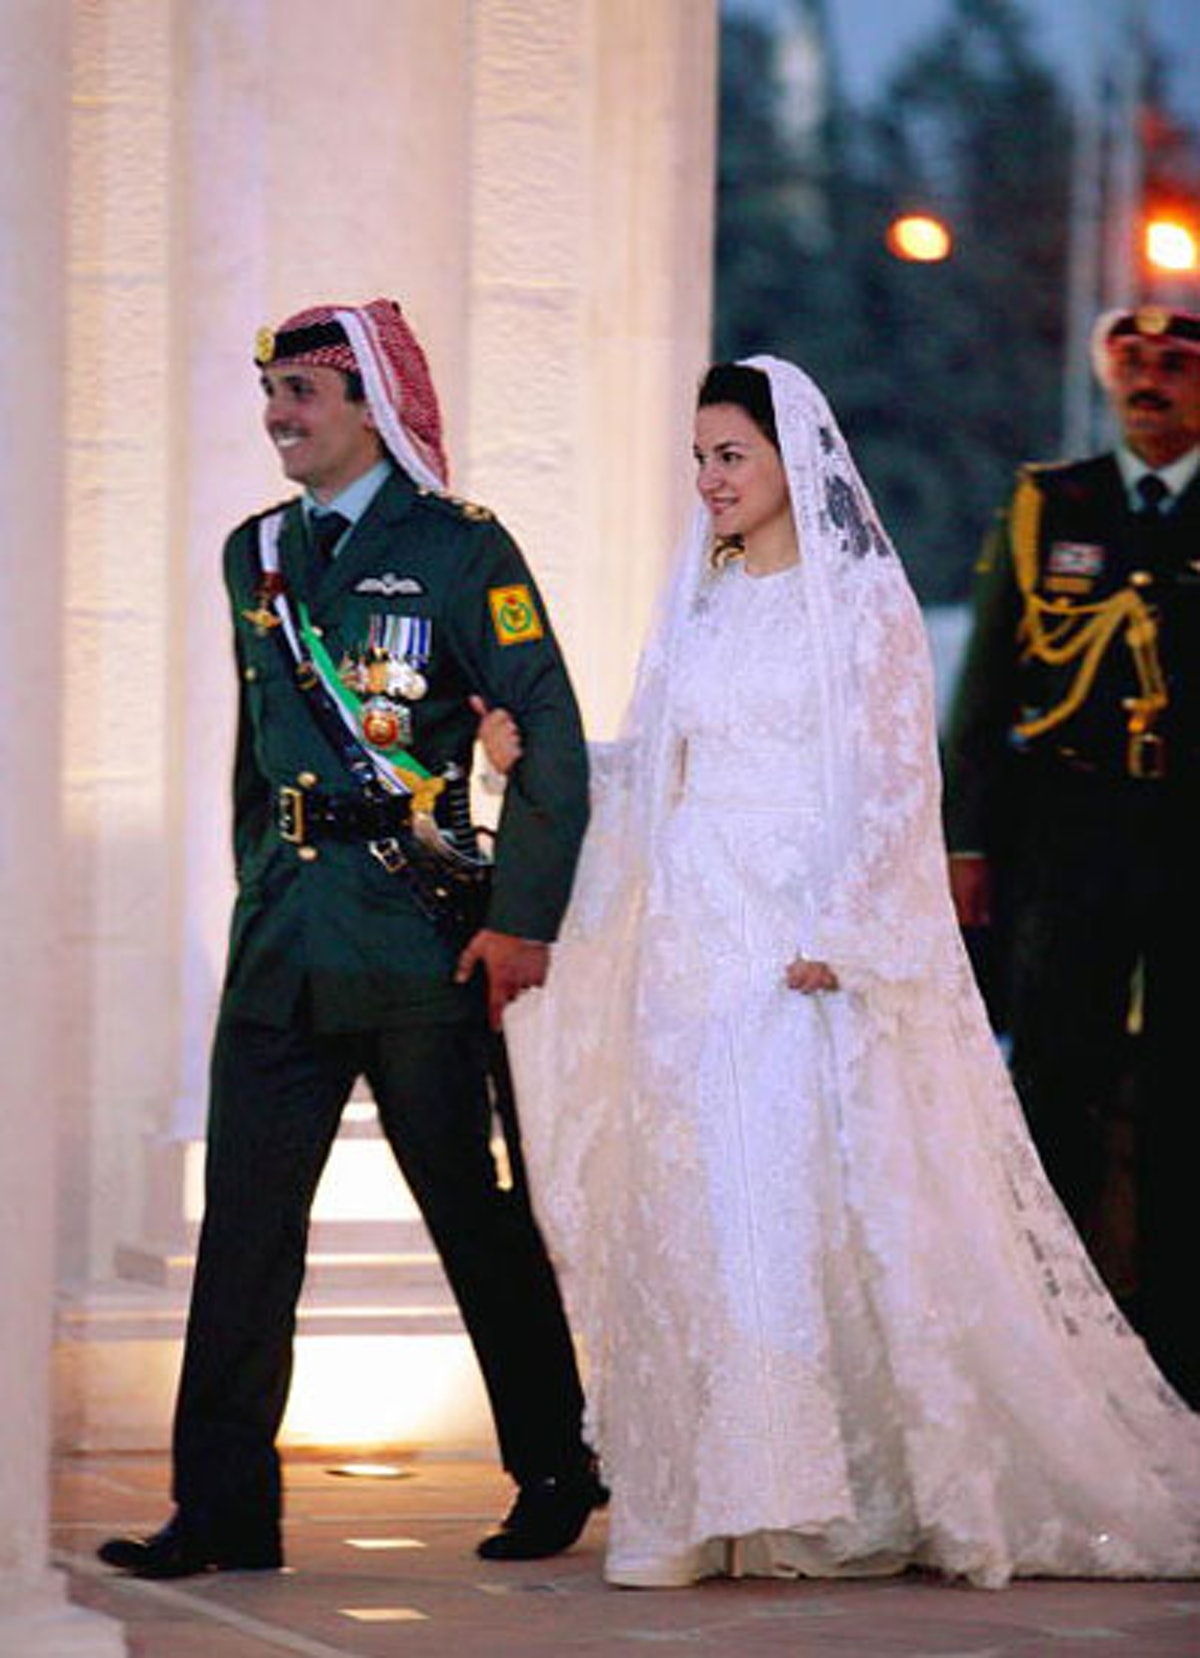 soss-royal-wedding-fashion-03-v.jpg